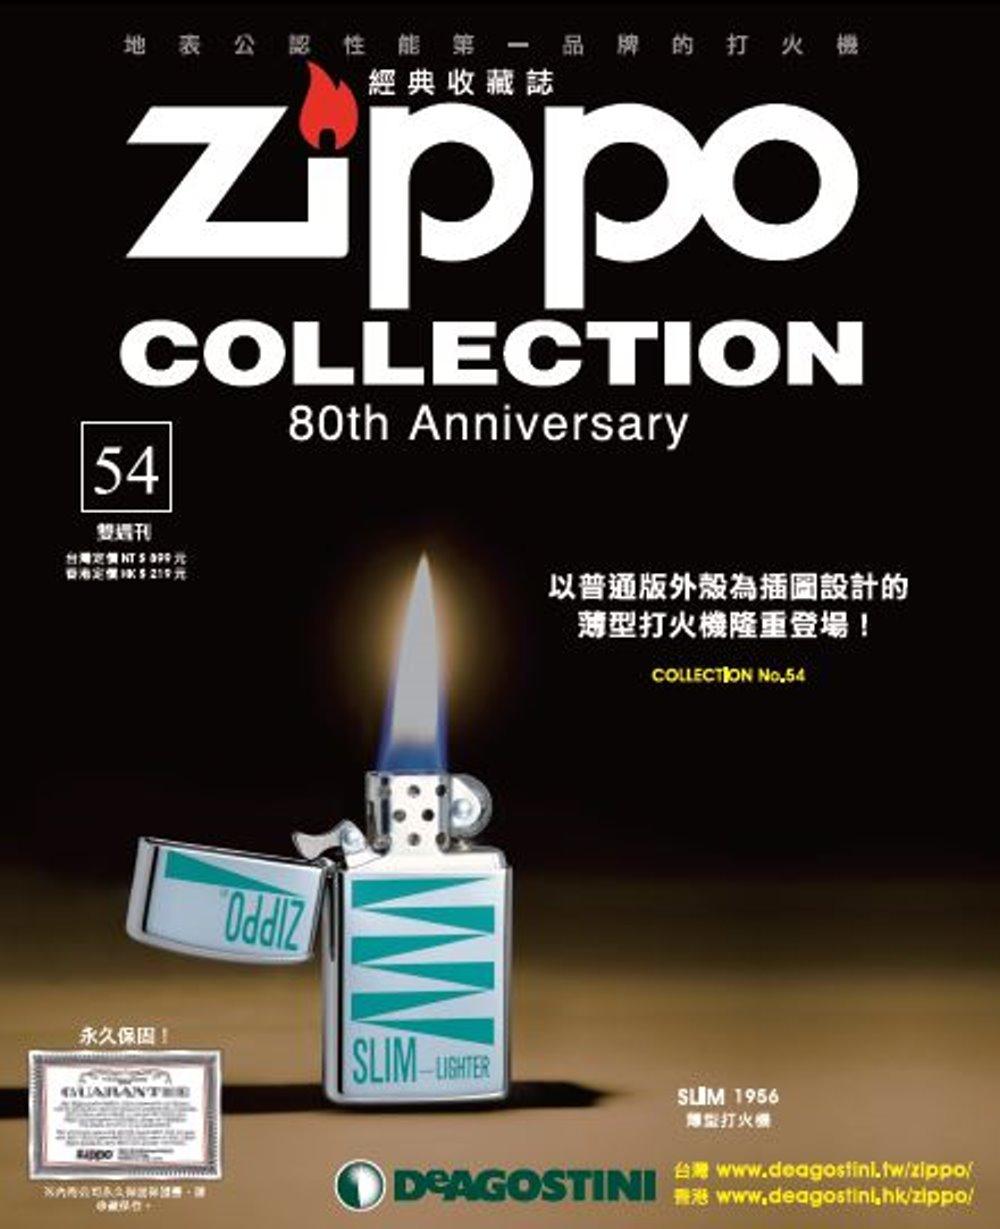 Zippo經典收藏誌 2017/10/23第54期